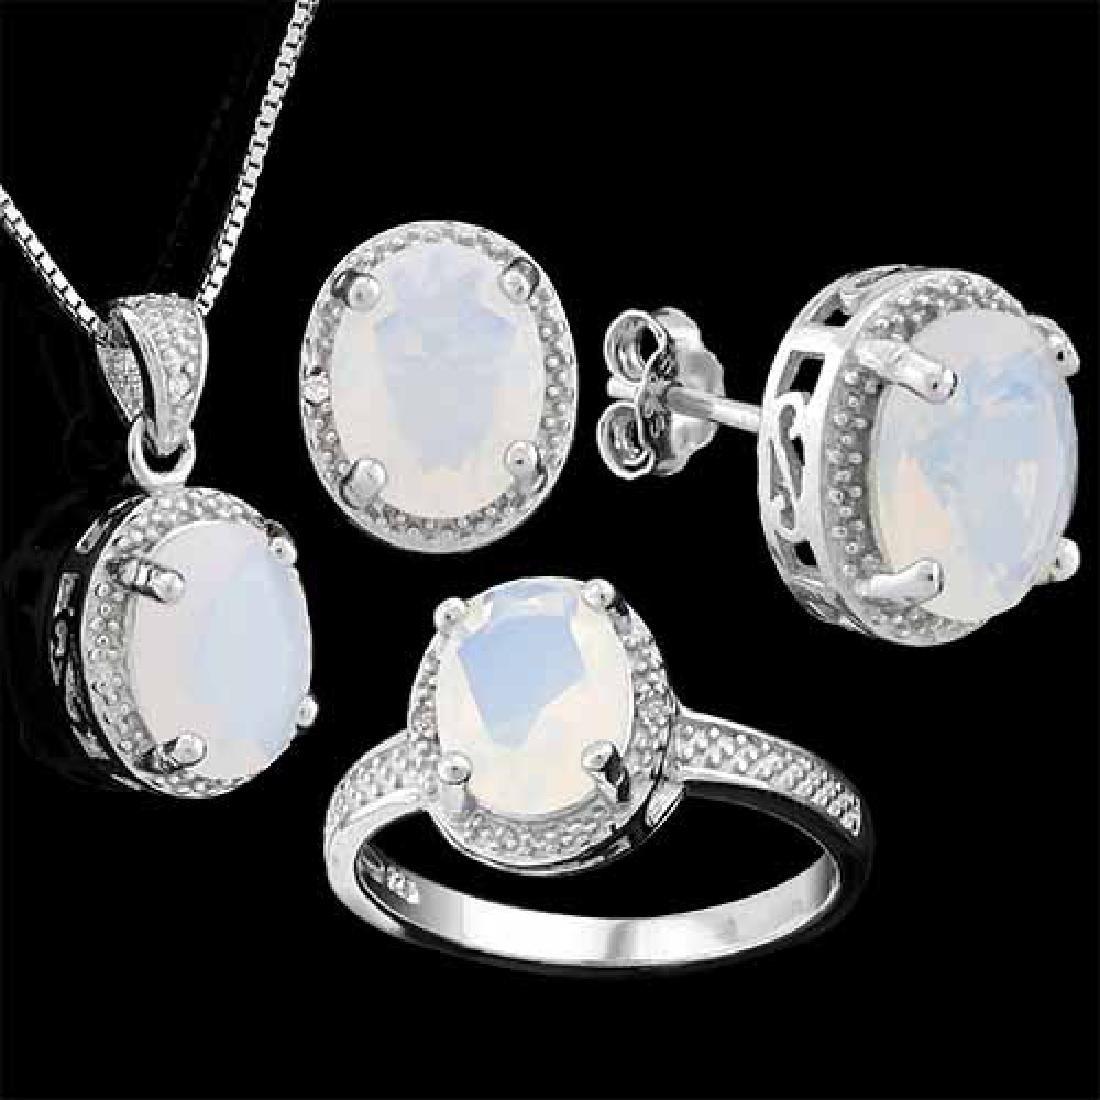 6 CARAT CREATED FIRE OPAL & DIAMOND 925 STERLING SILVER